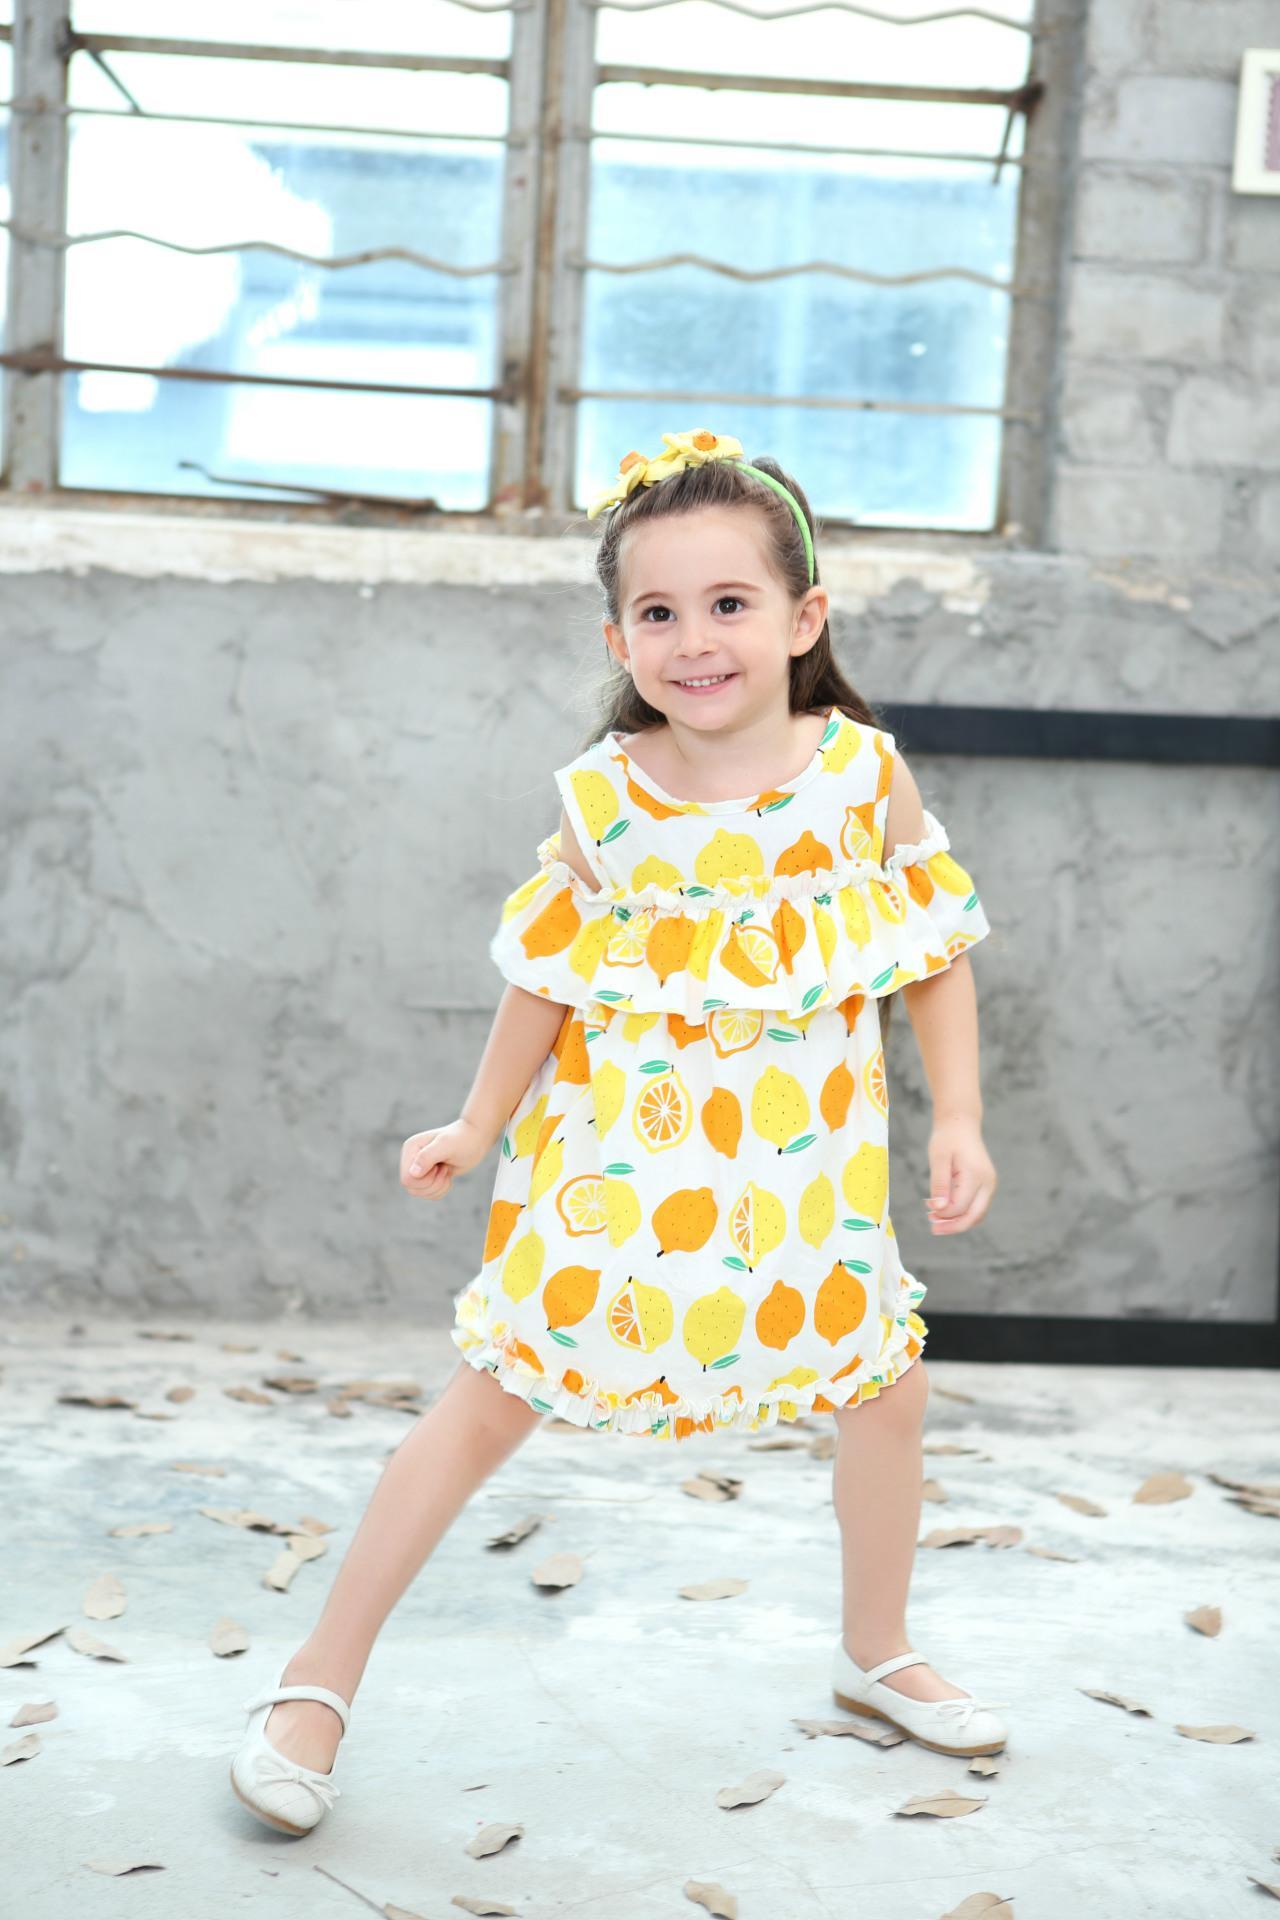 Lemon Printd Girls Dress 2018 New Summer Fashion Children Princess Dress Kids Children Clothes For 2 3 4 5 6 7 8 Years 5